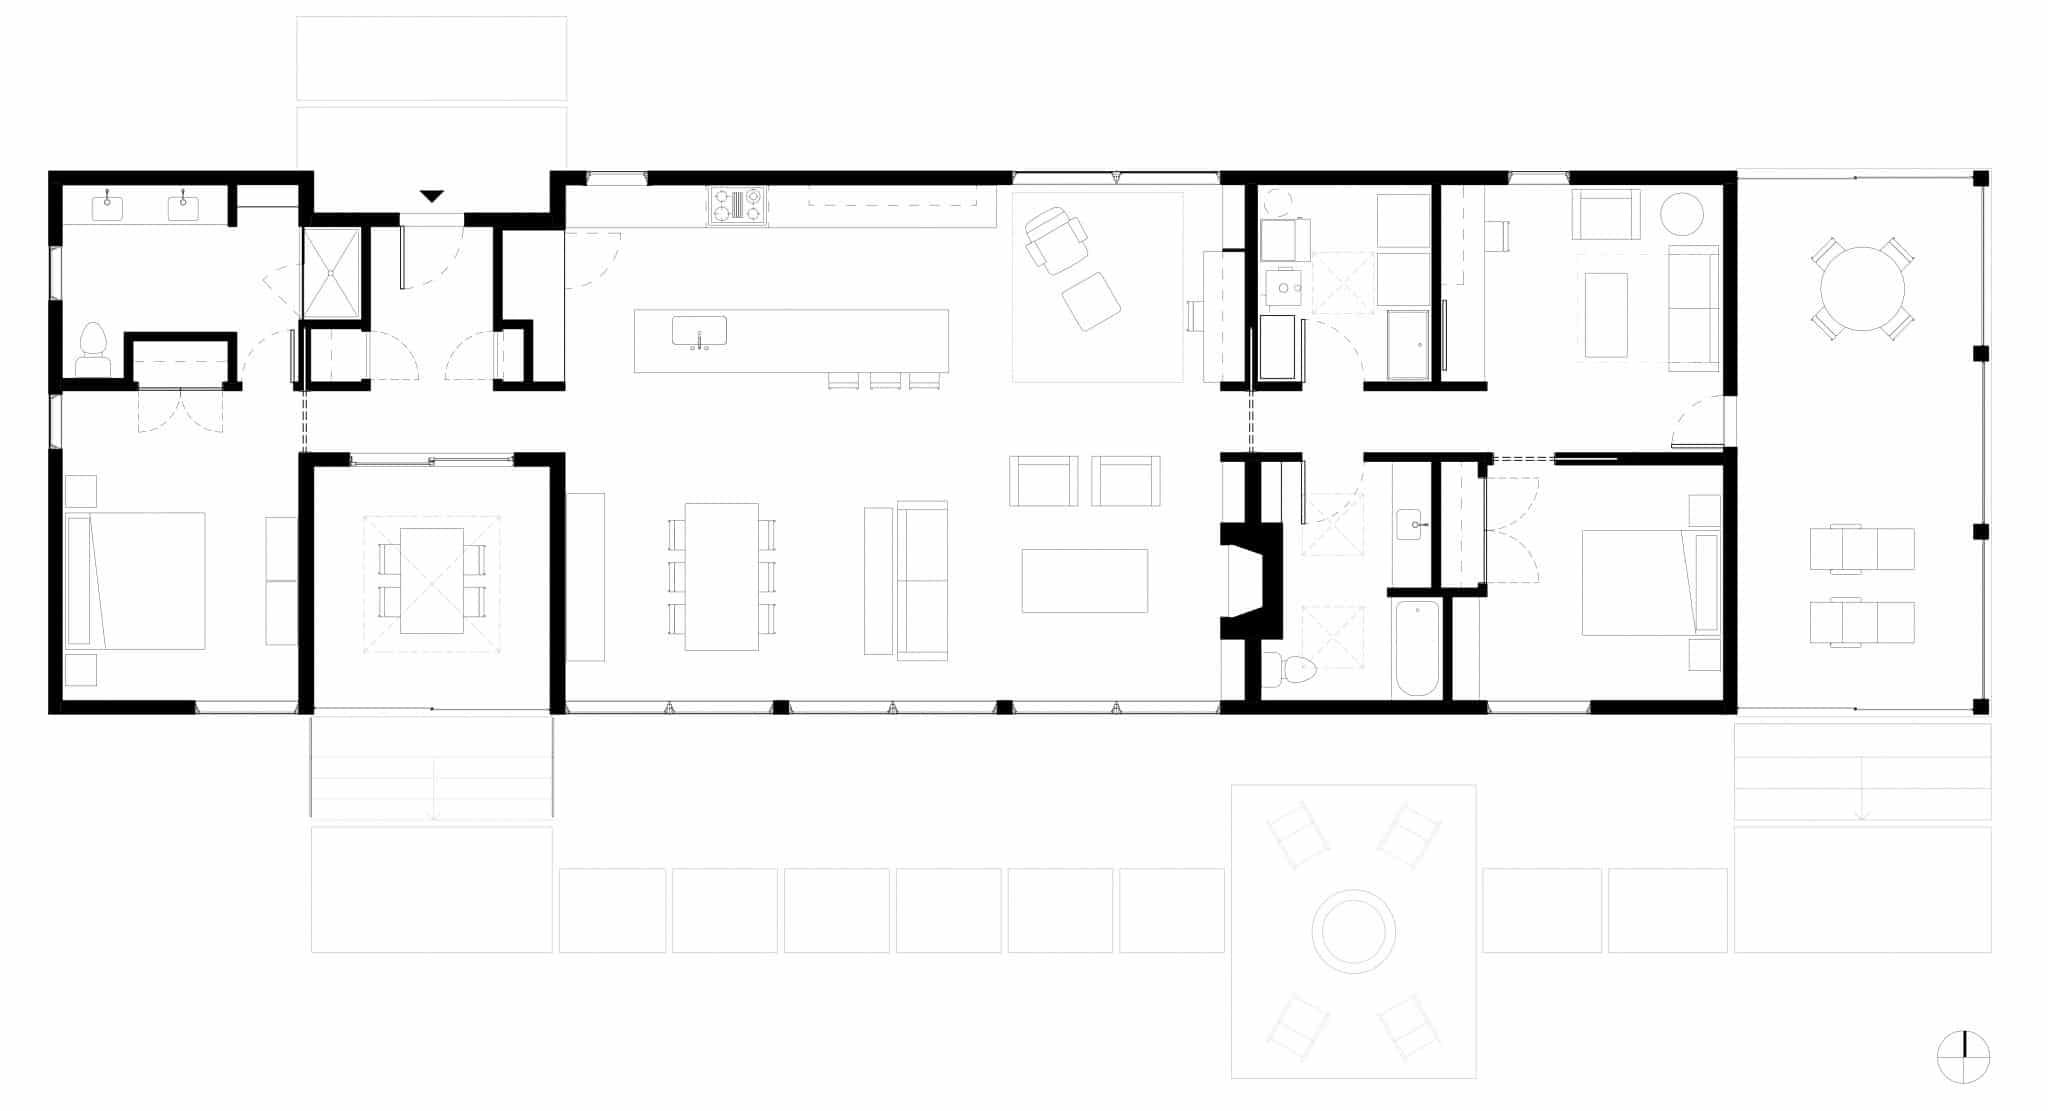 C:UserscbartekDocuments1633 Delancey Residence_CDs 2019_cbar